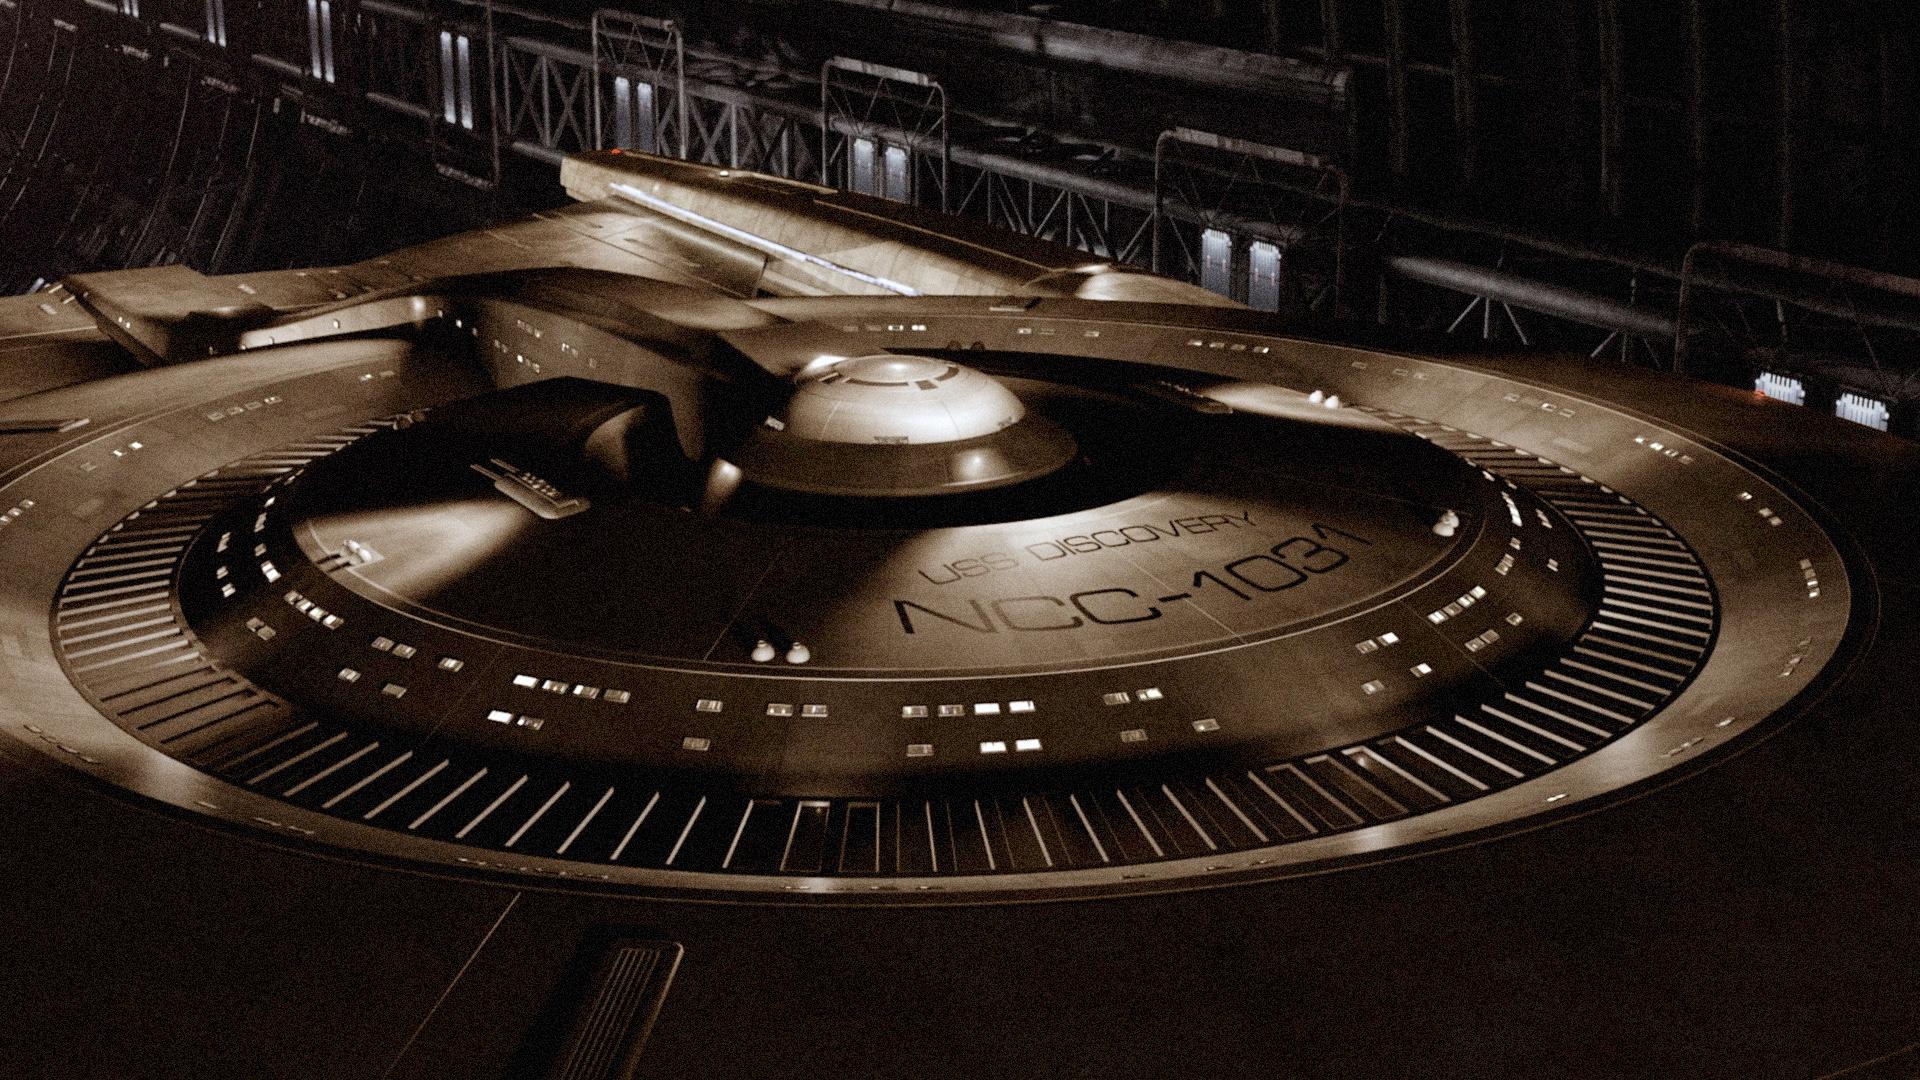 Logbuch des Captains 1 – Star Trek Discovery